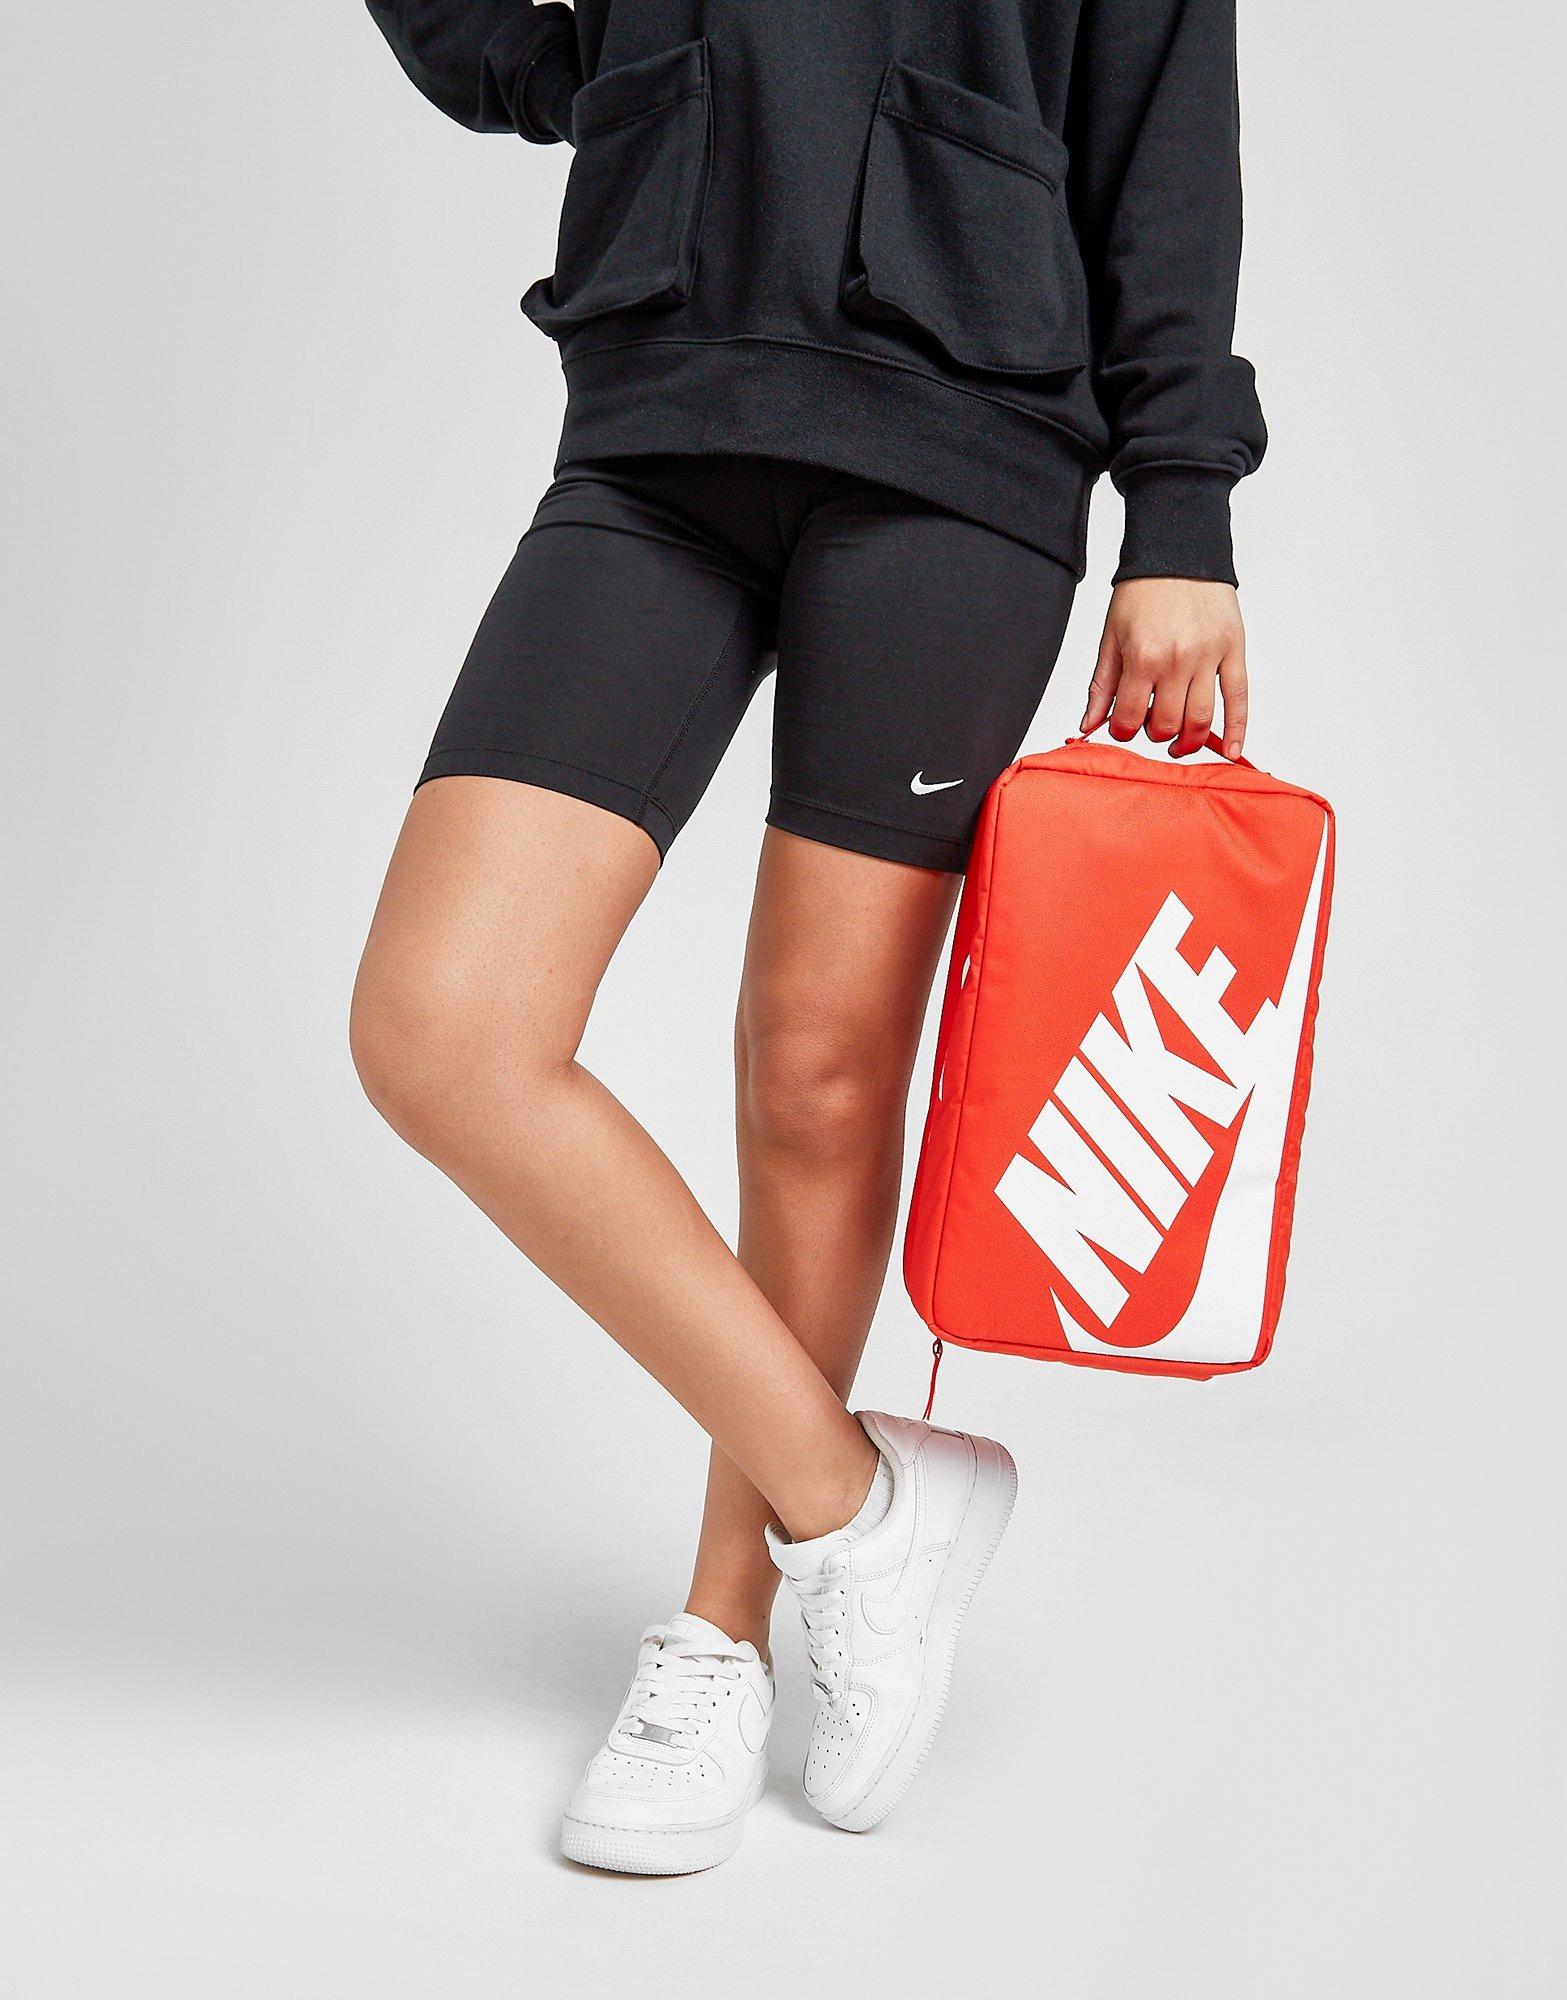 Nike shoe bag original